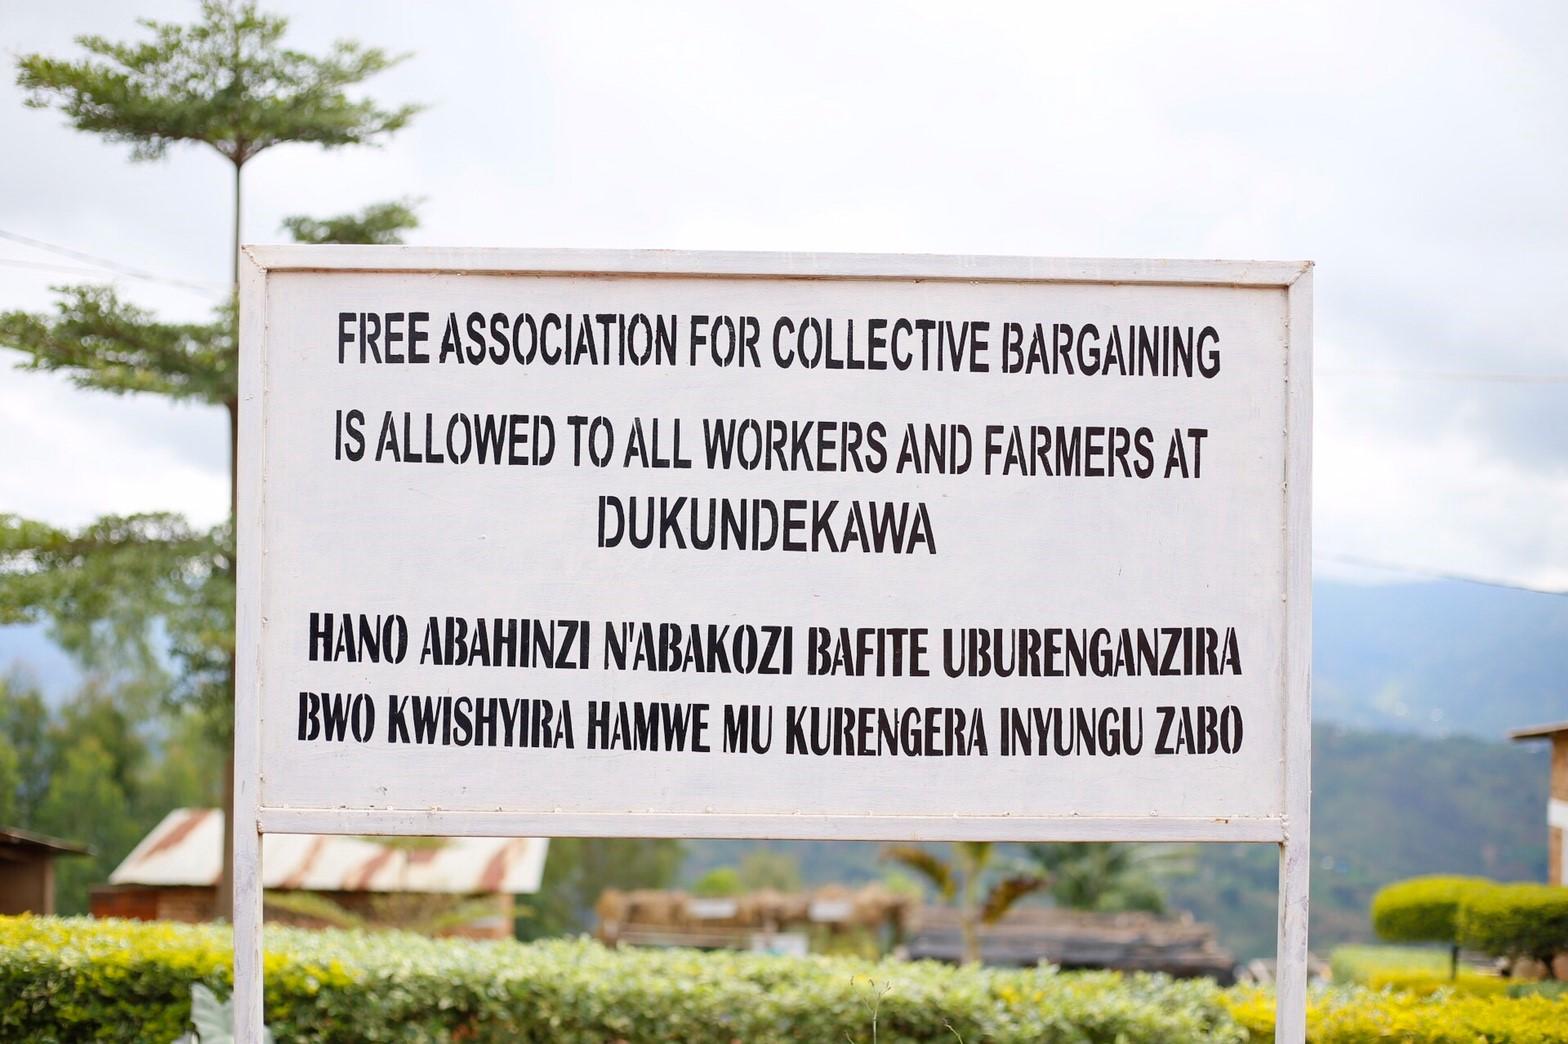 【VISIT TO RWANDA】MUSASA RULI CWS